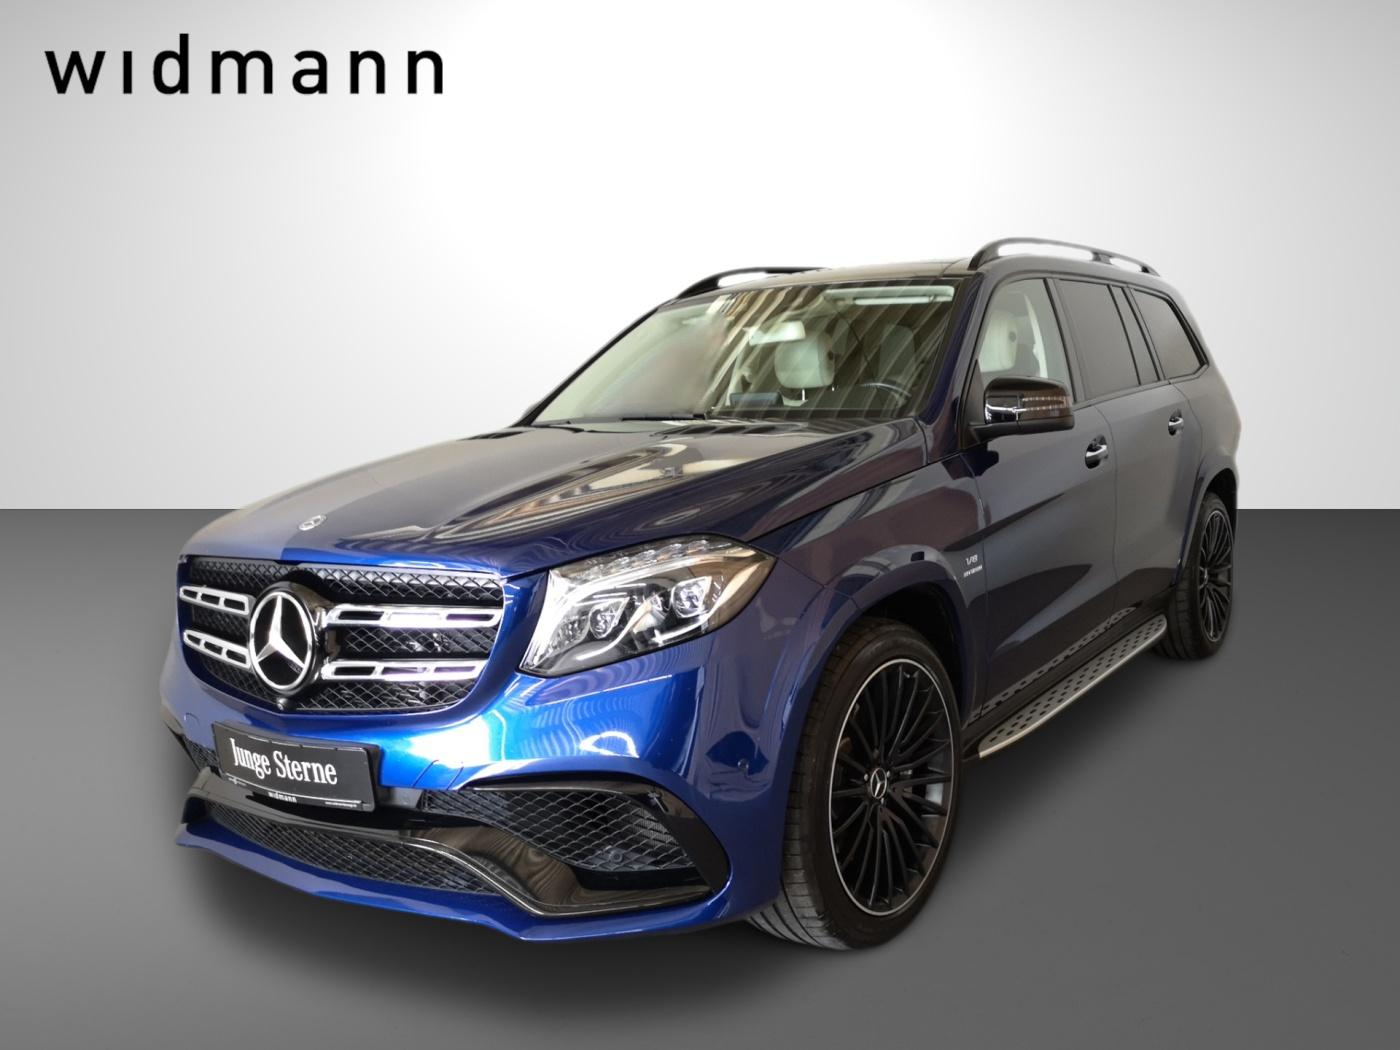 Mercedes-Benz GLS 63 AMG 4MATIC Sitzklima*Pano*AK*Active Curve, Jahr 2017, Benzin